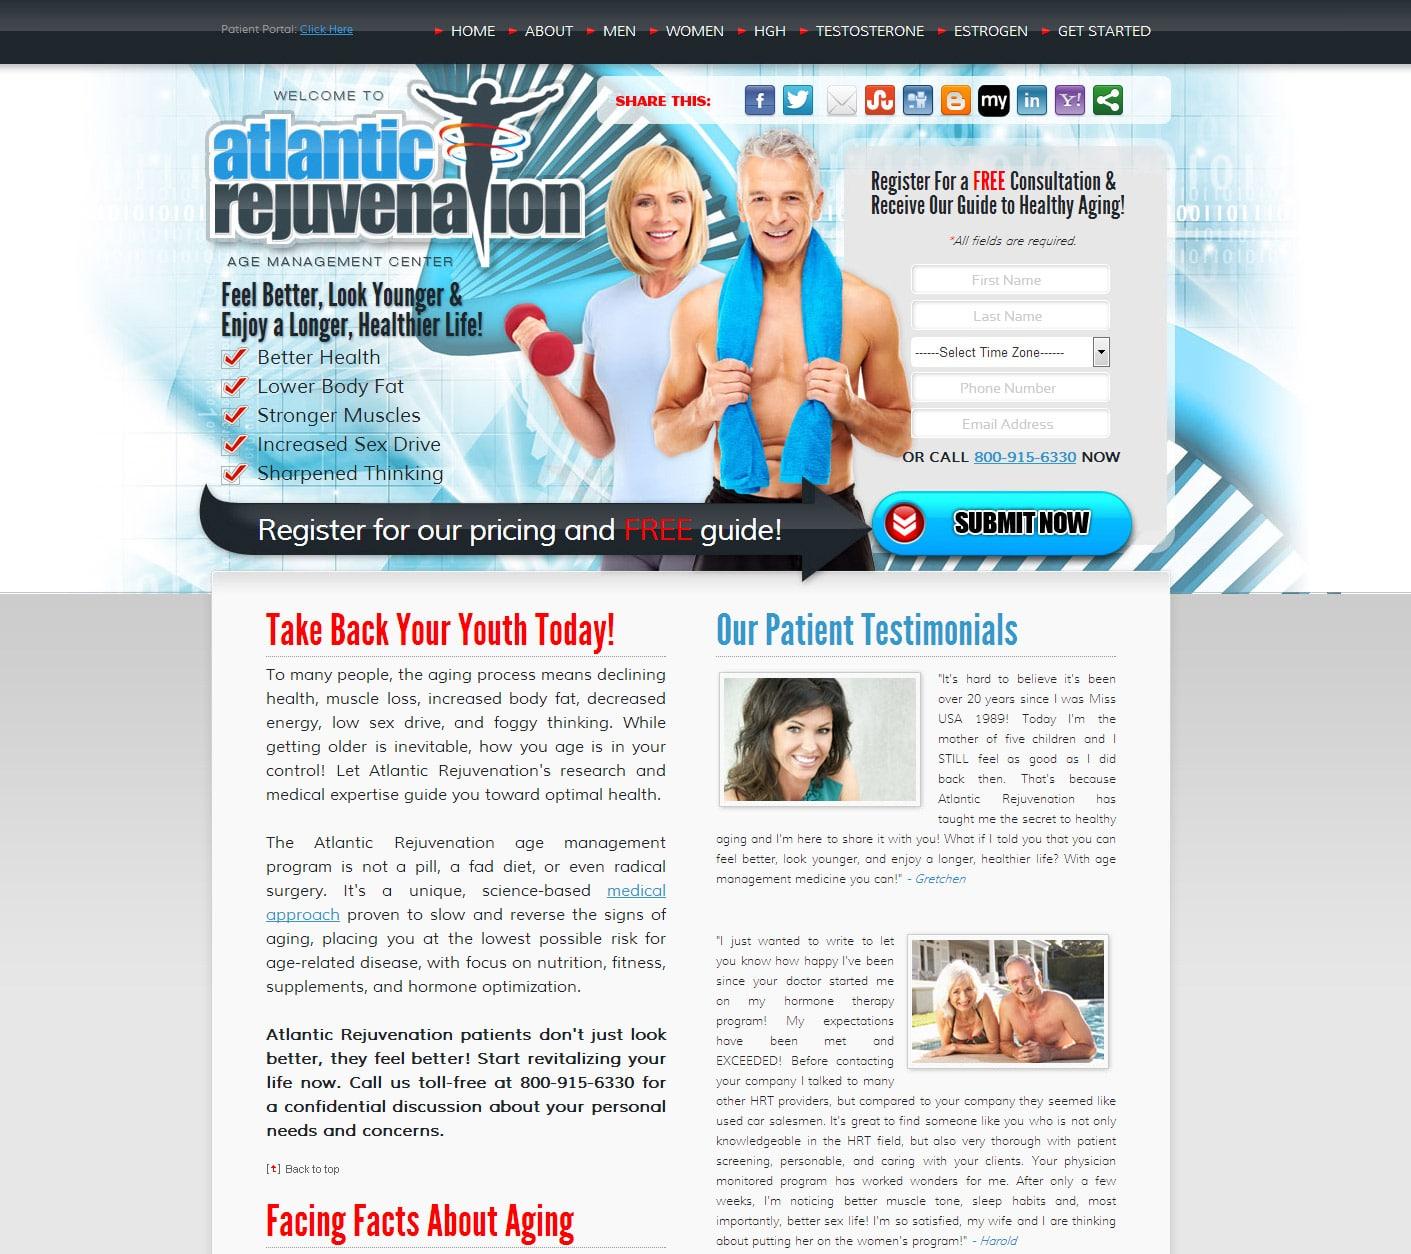 Atlantic Rejuvenation v2